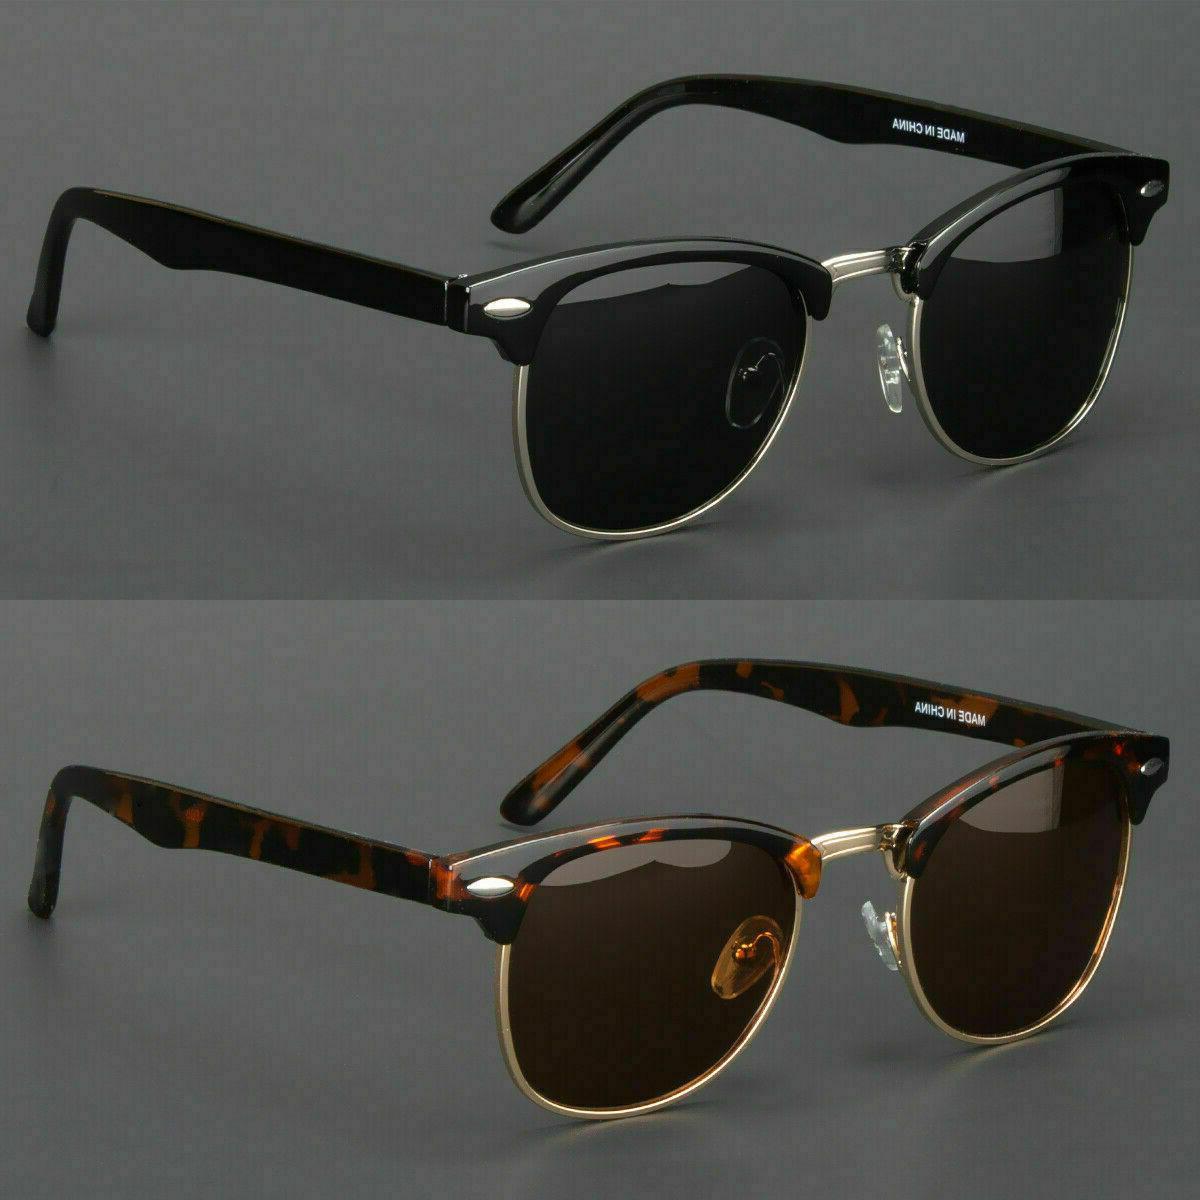 new polarized retro sunglasses mens womens vintage